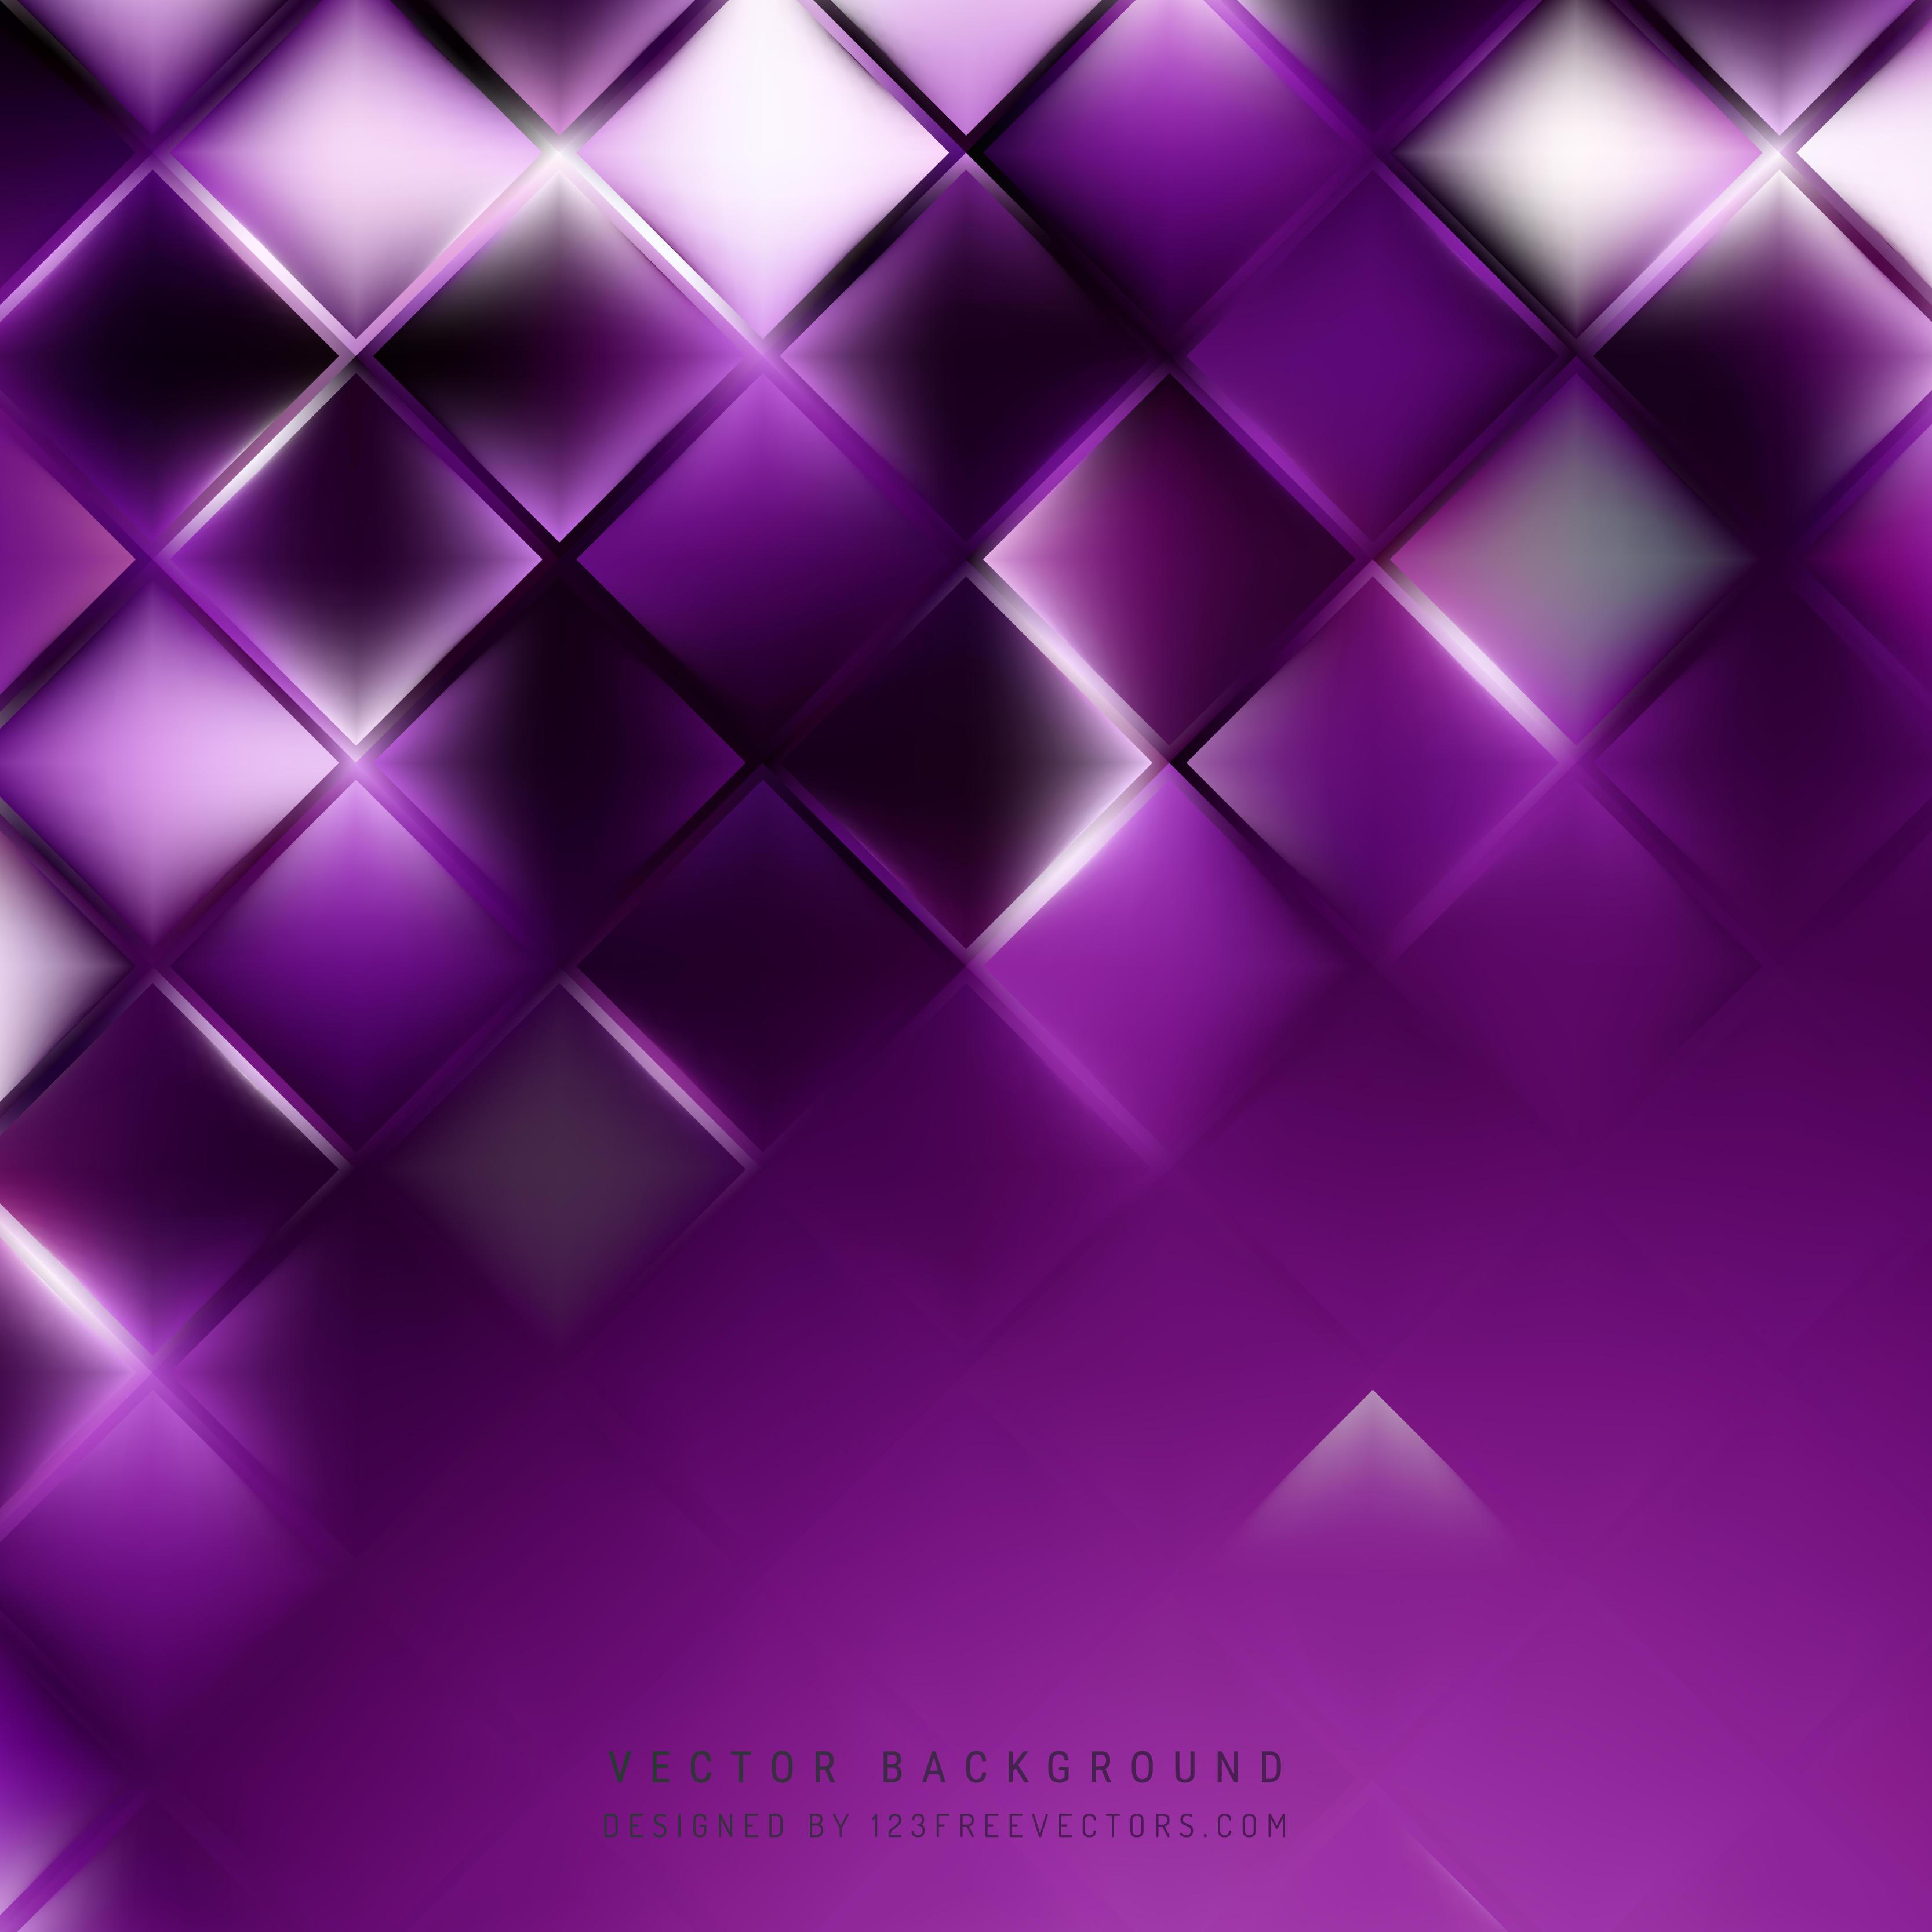 Dark purple square background image 123freevectors abstract dark purple square background pattern preview voltagebd Image collections